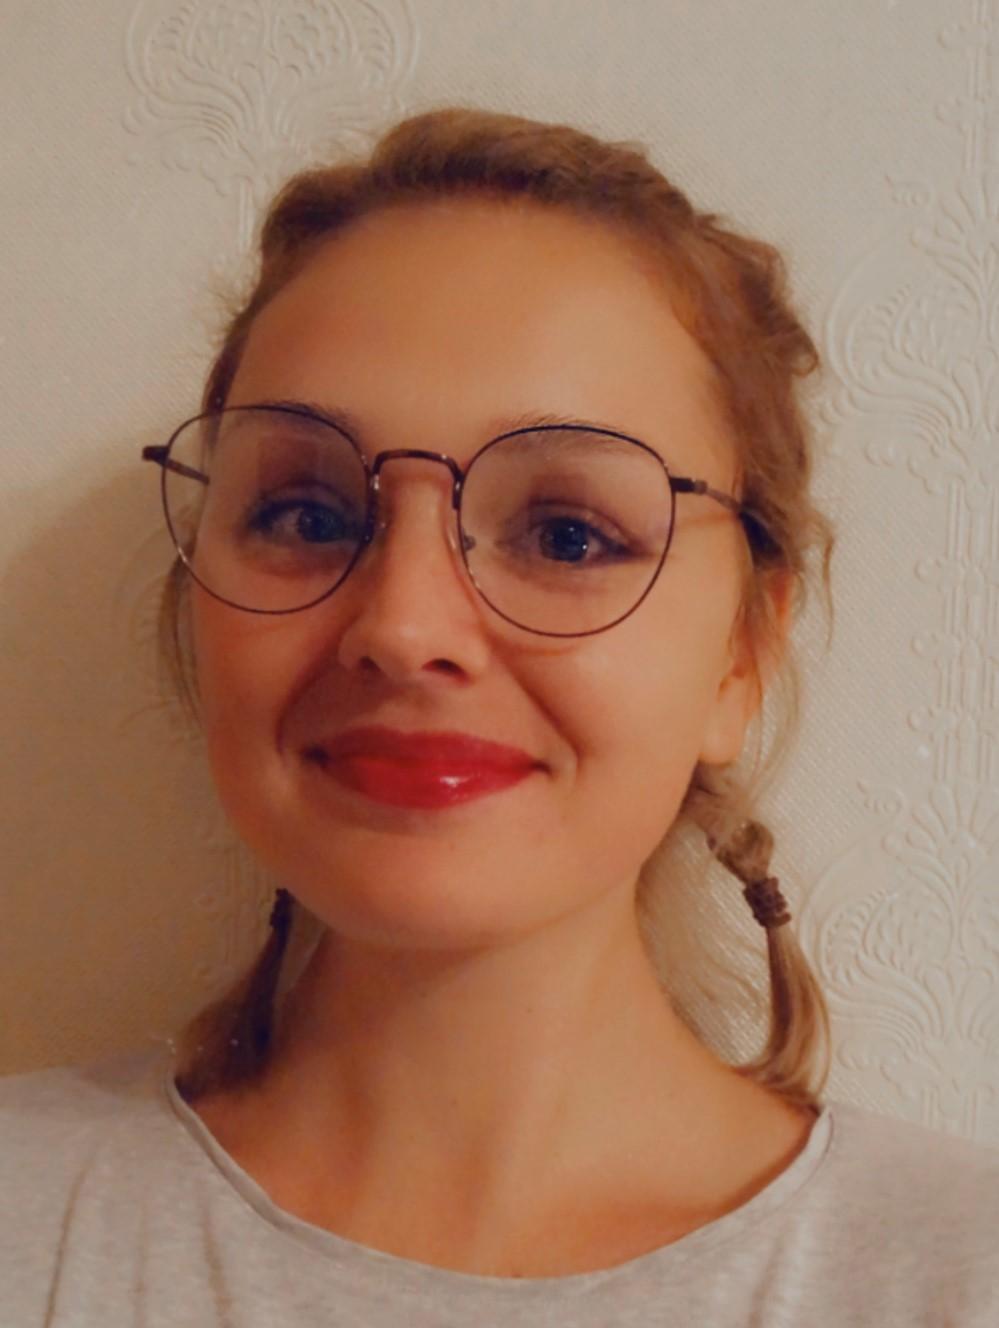 Chloe Sargent